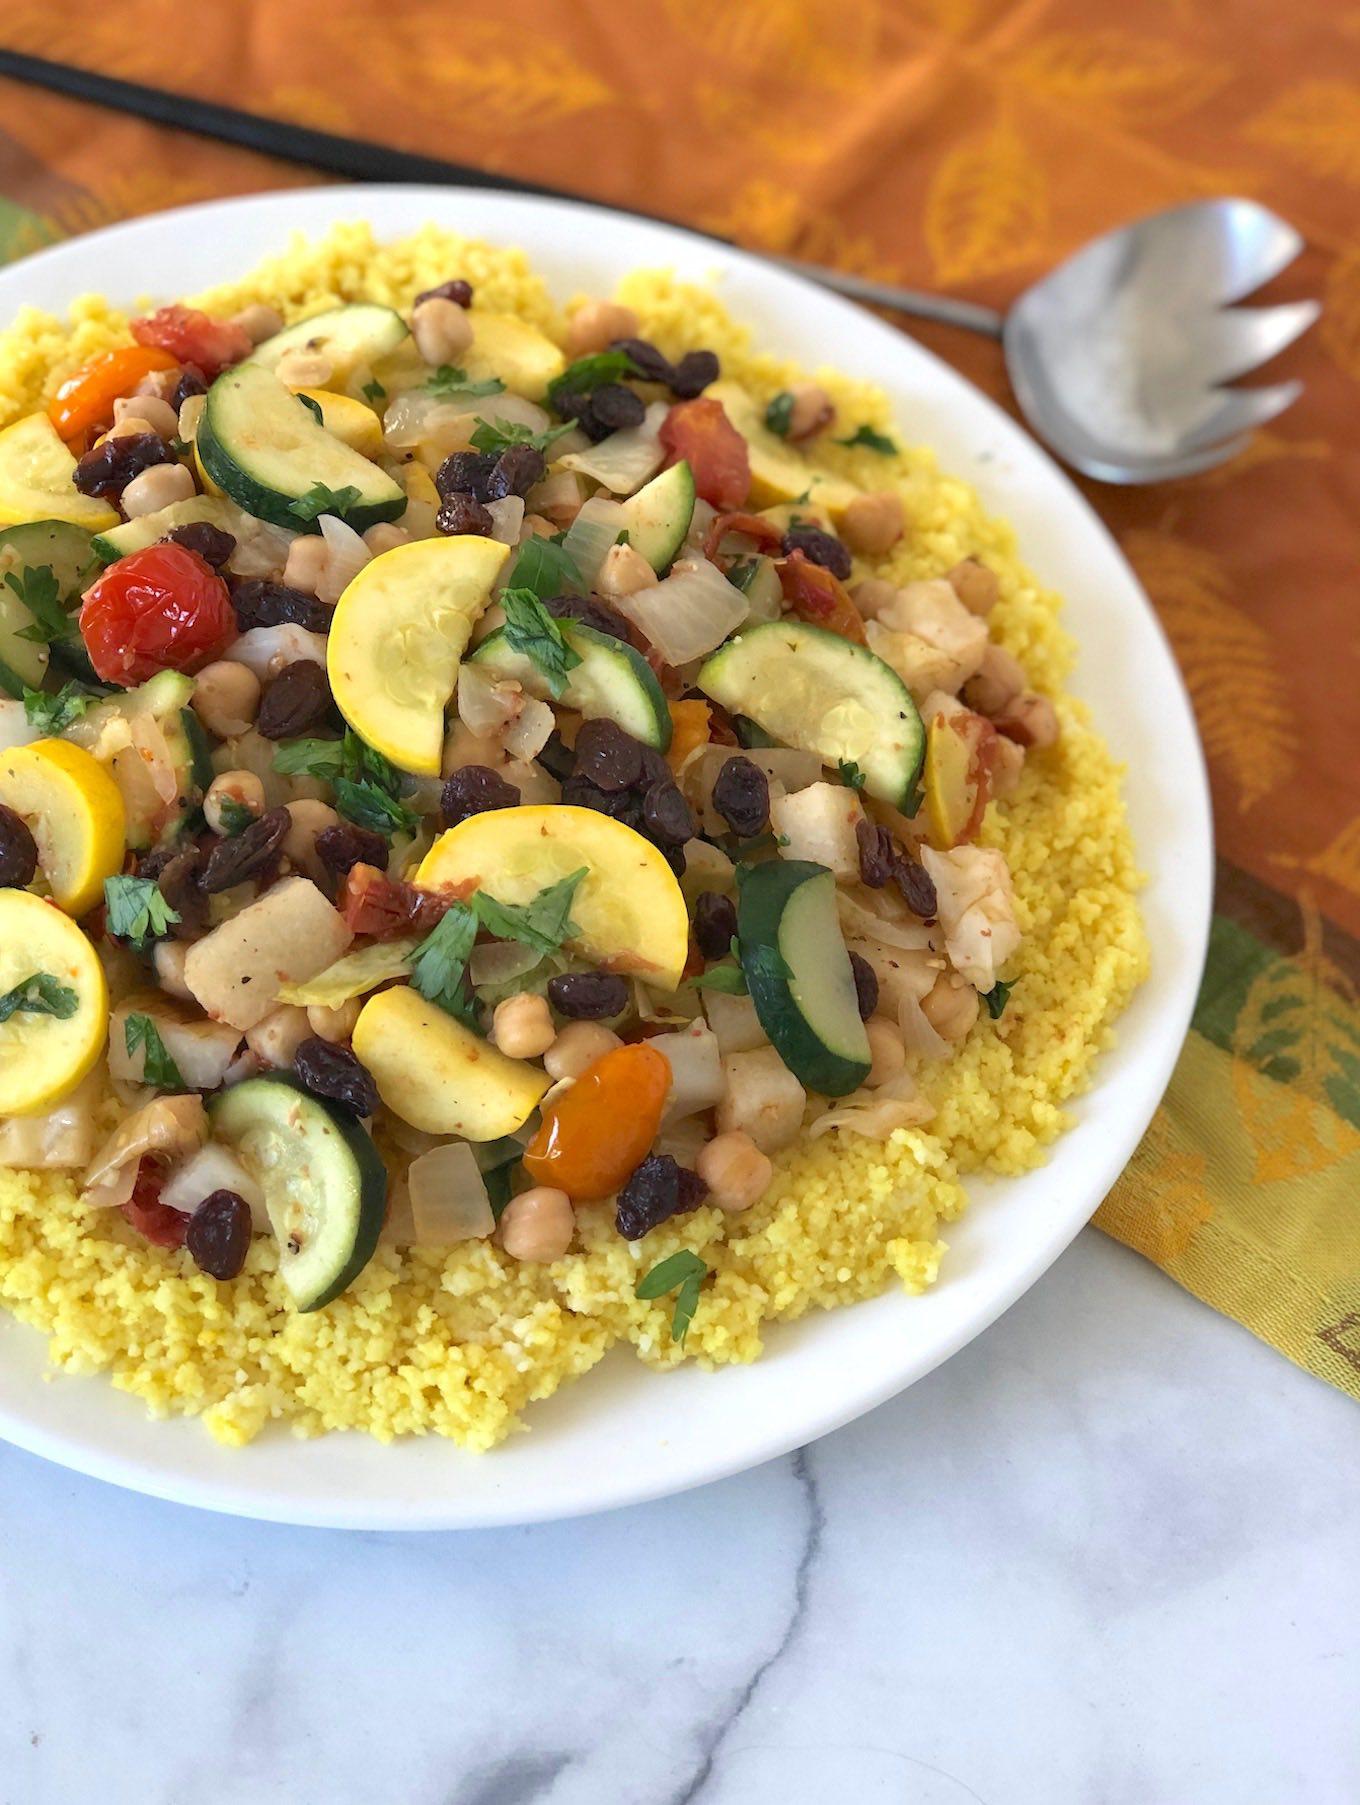 Seven vegetable couscous for Rosh Hashanah